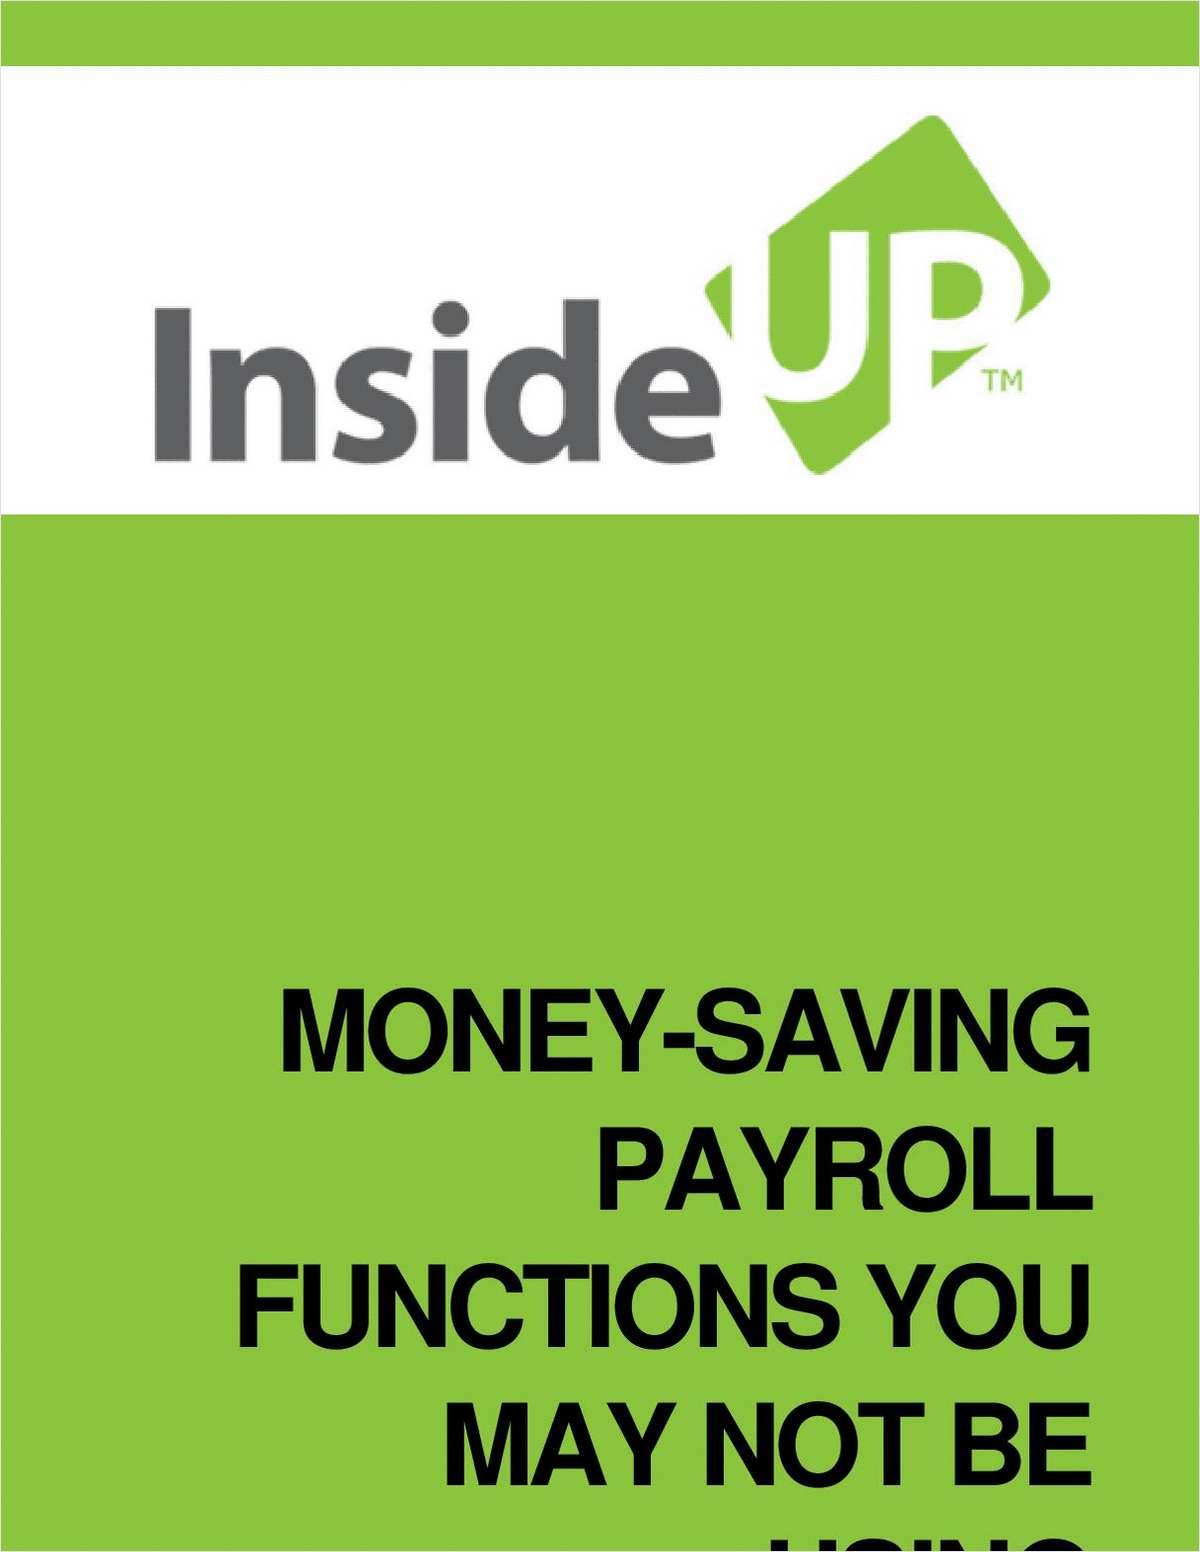 Money-Saving Payroll Functions You May Not Be Using